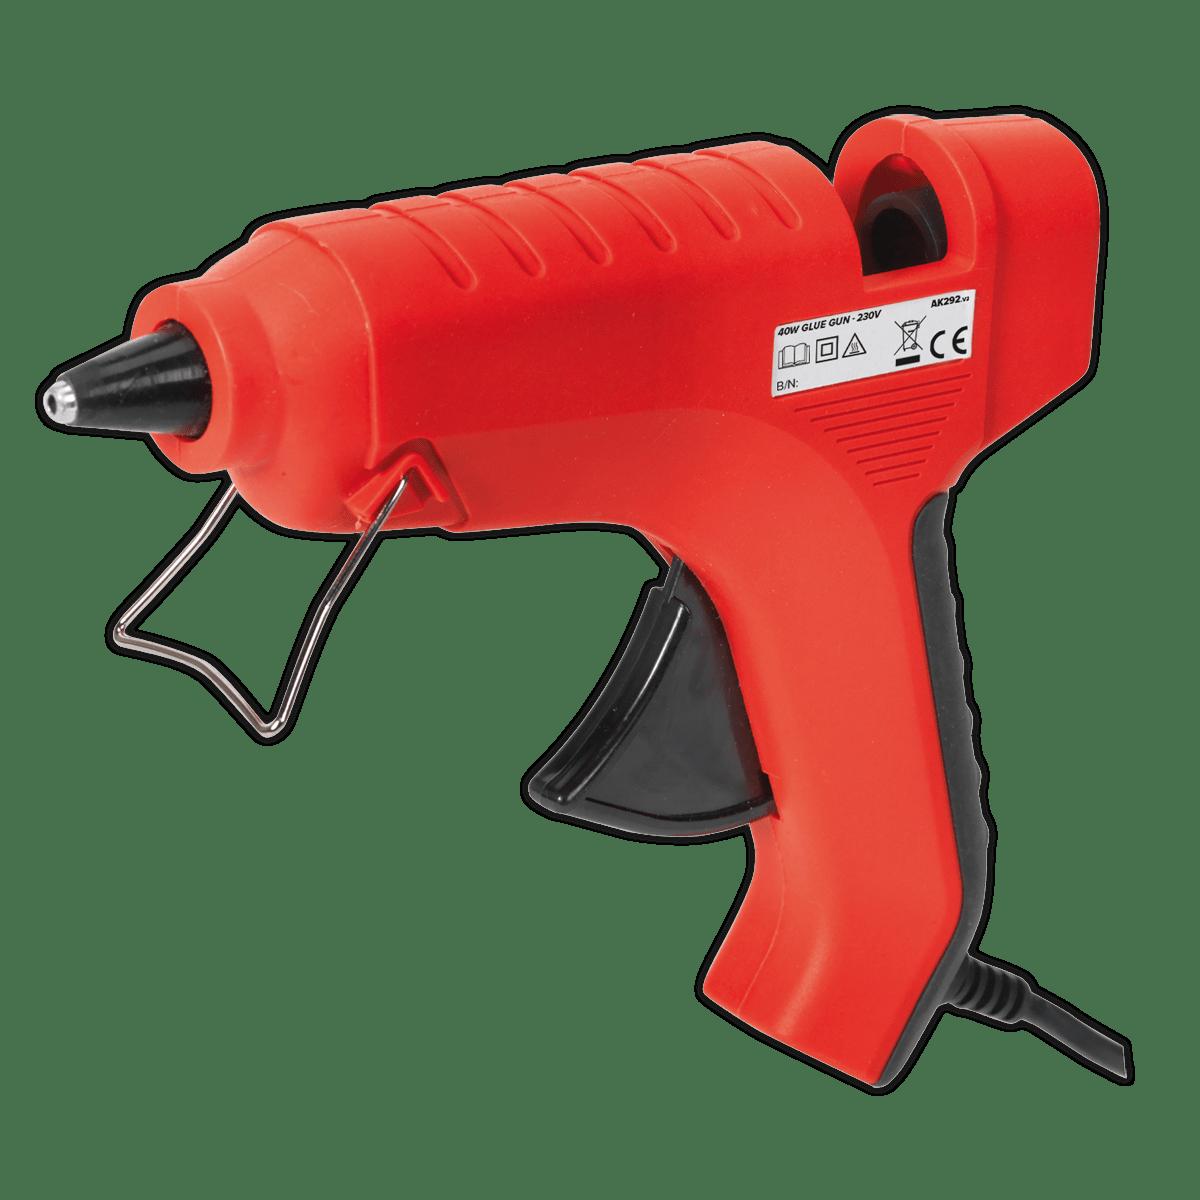 Sealey Glue Gun 40W 230V AK292